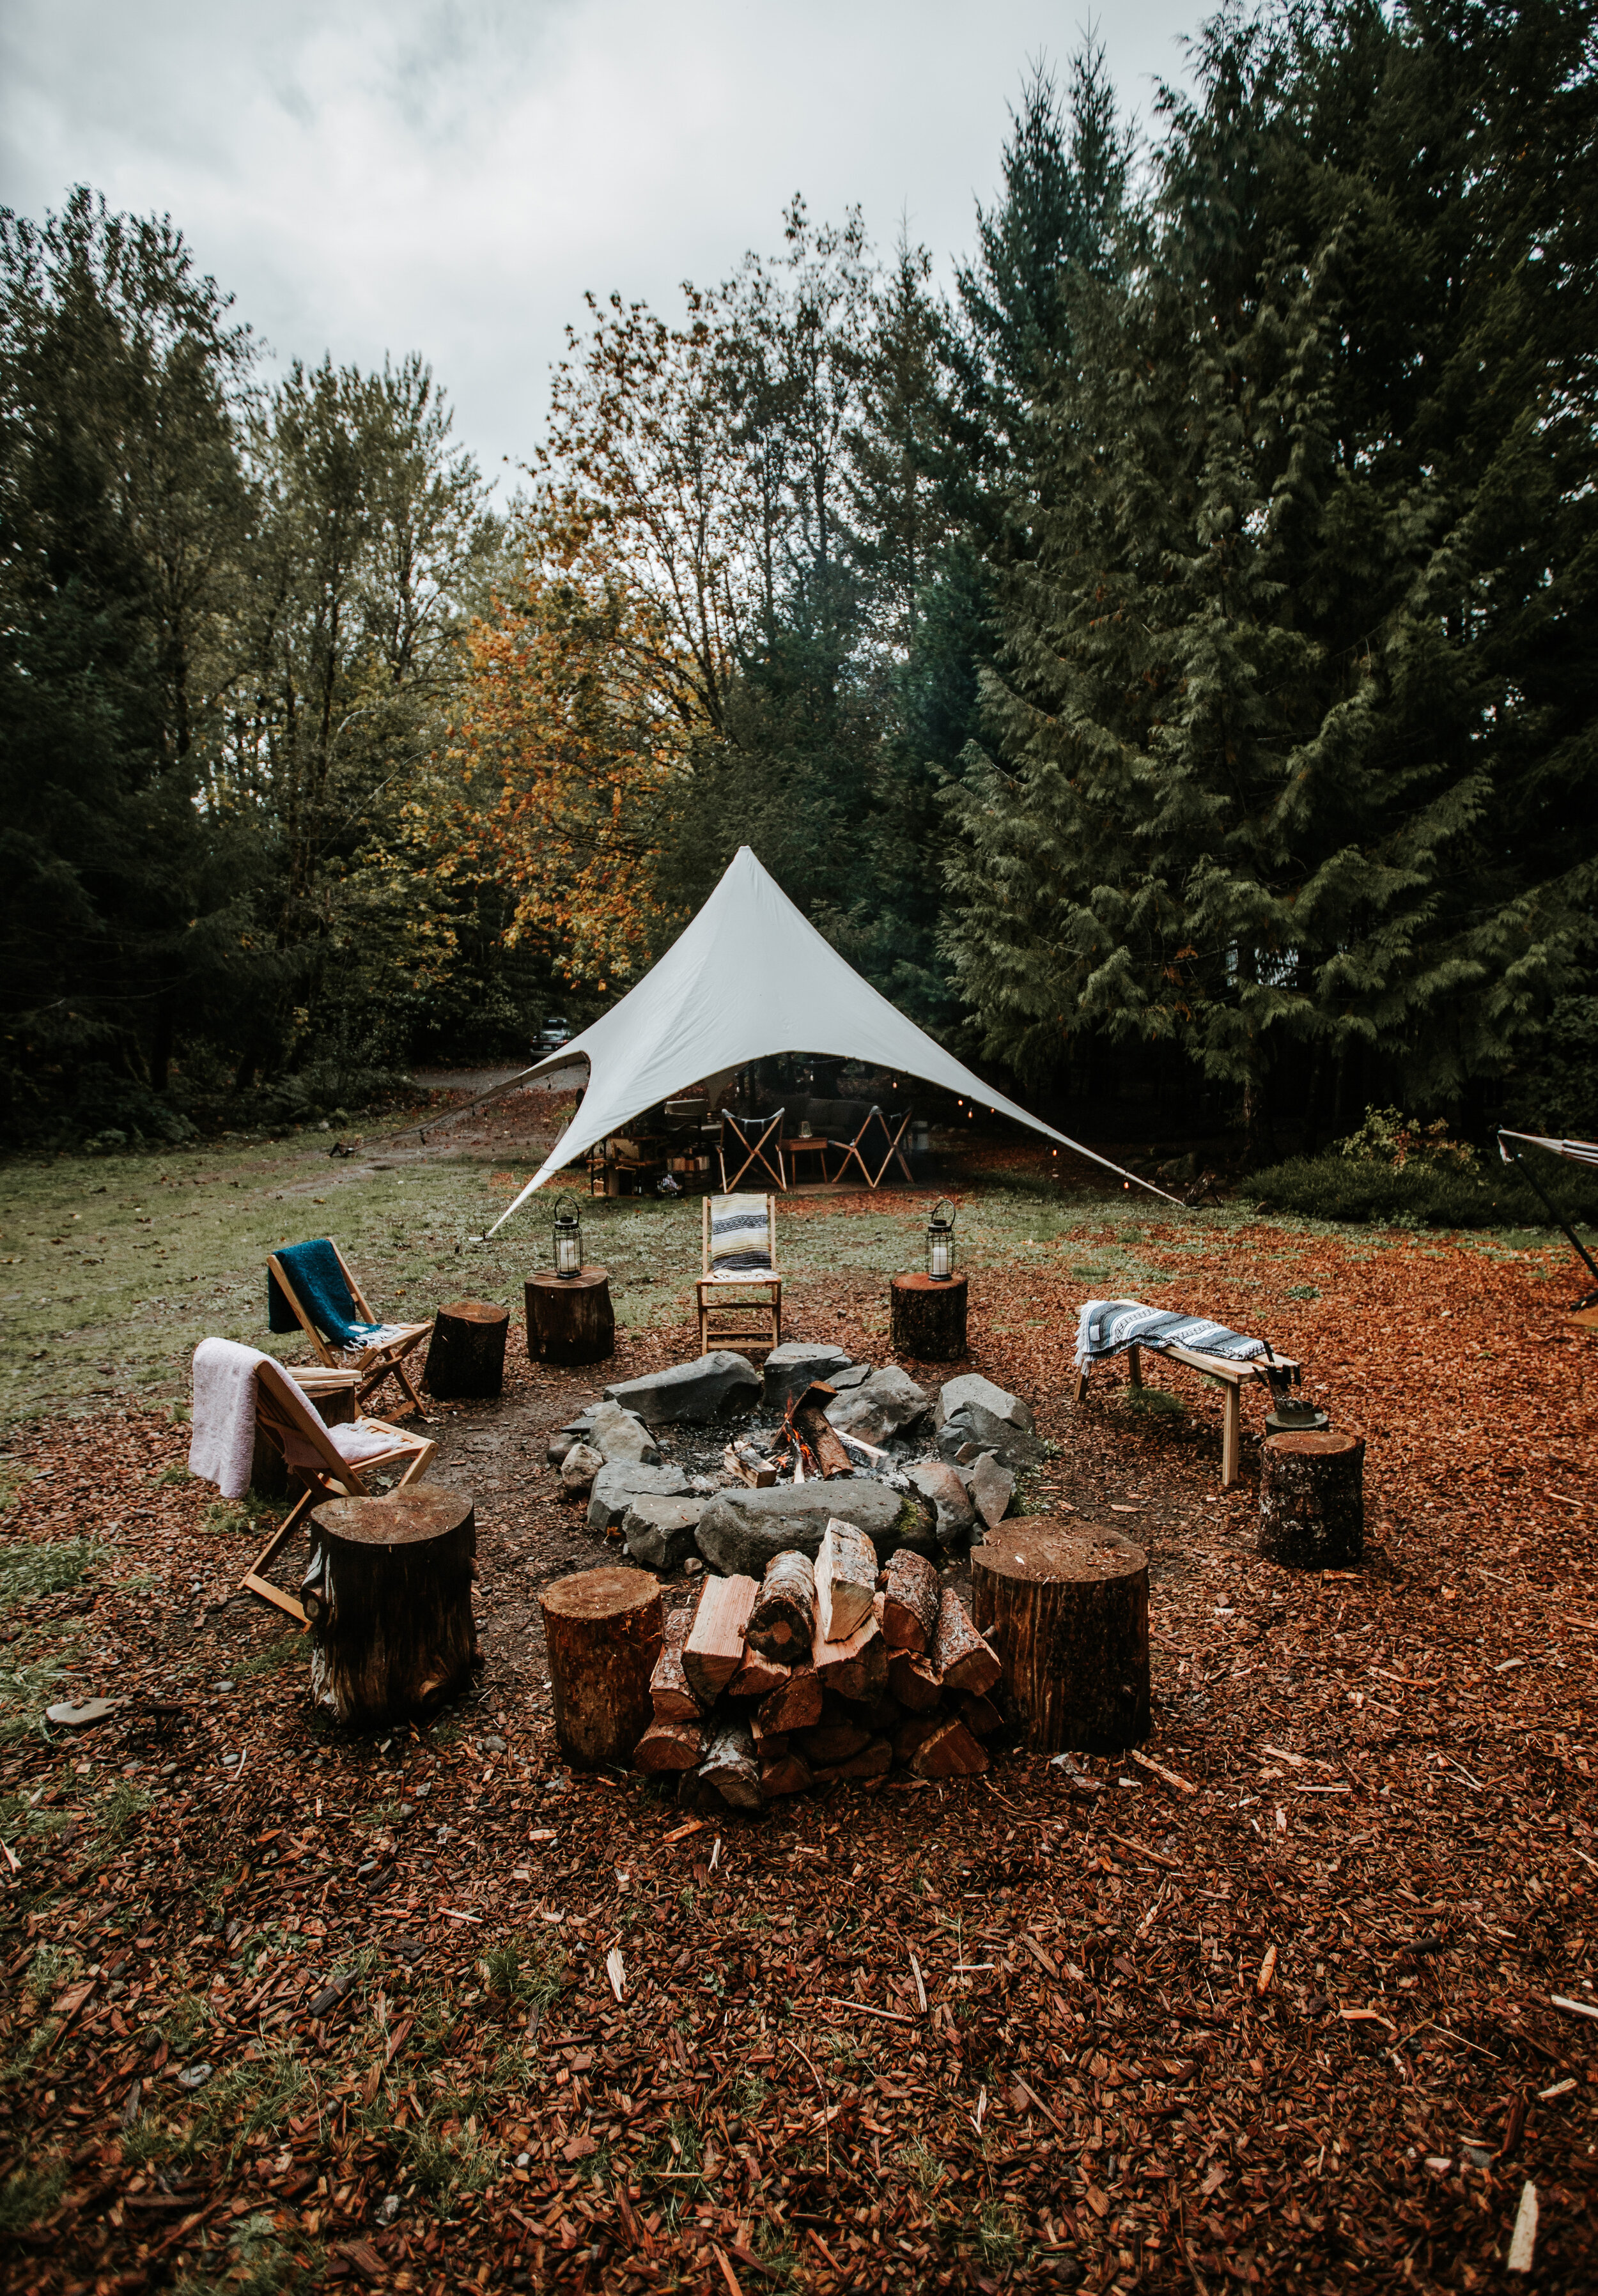 Camp Wanderlost